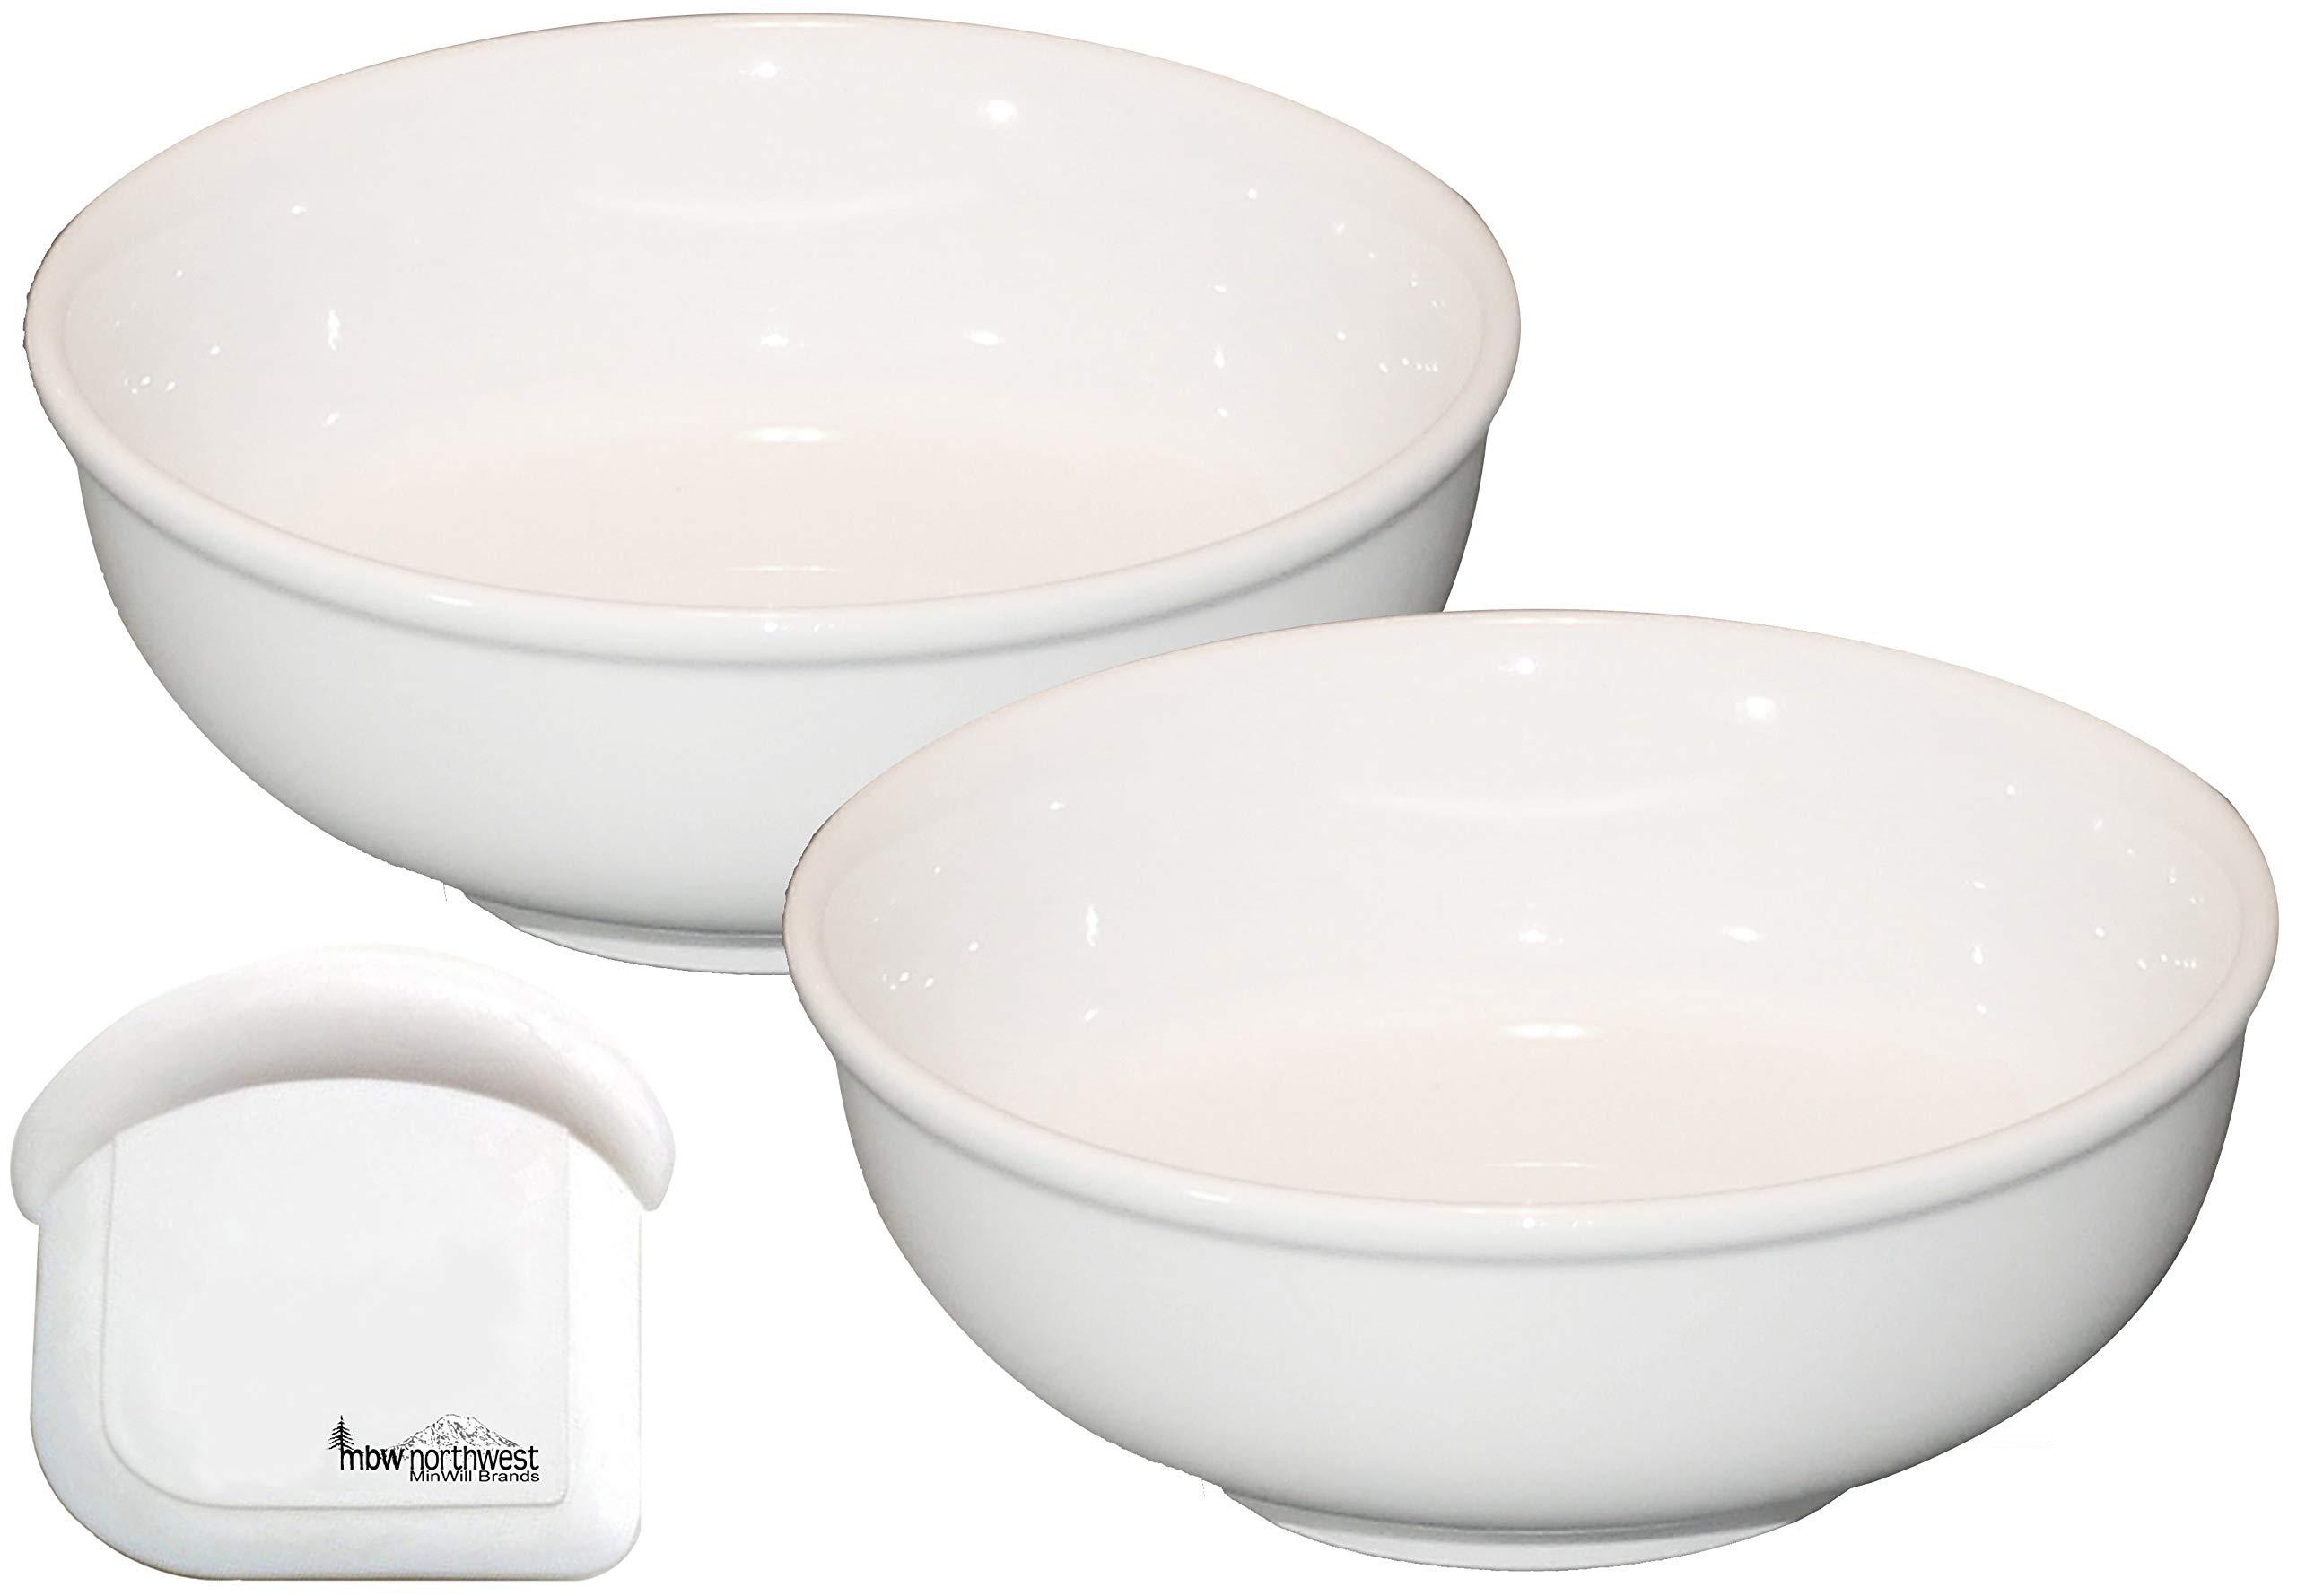 JapanBargain 2777x3 Soup Spoons White x3